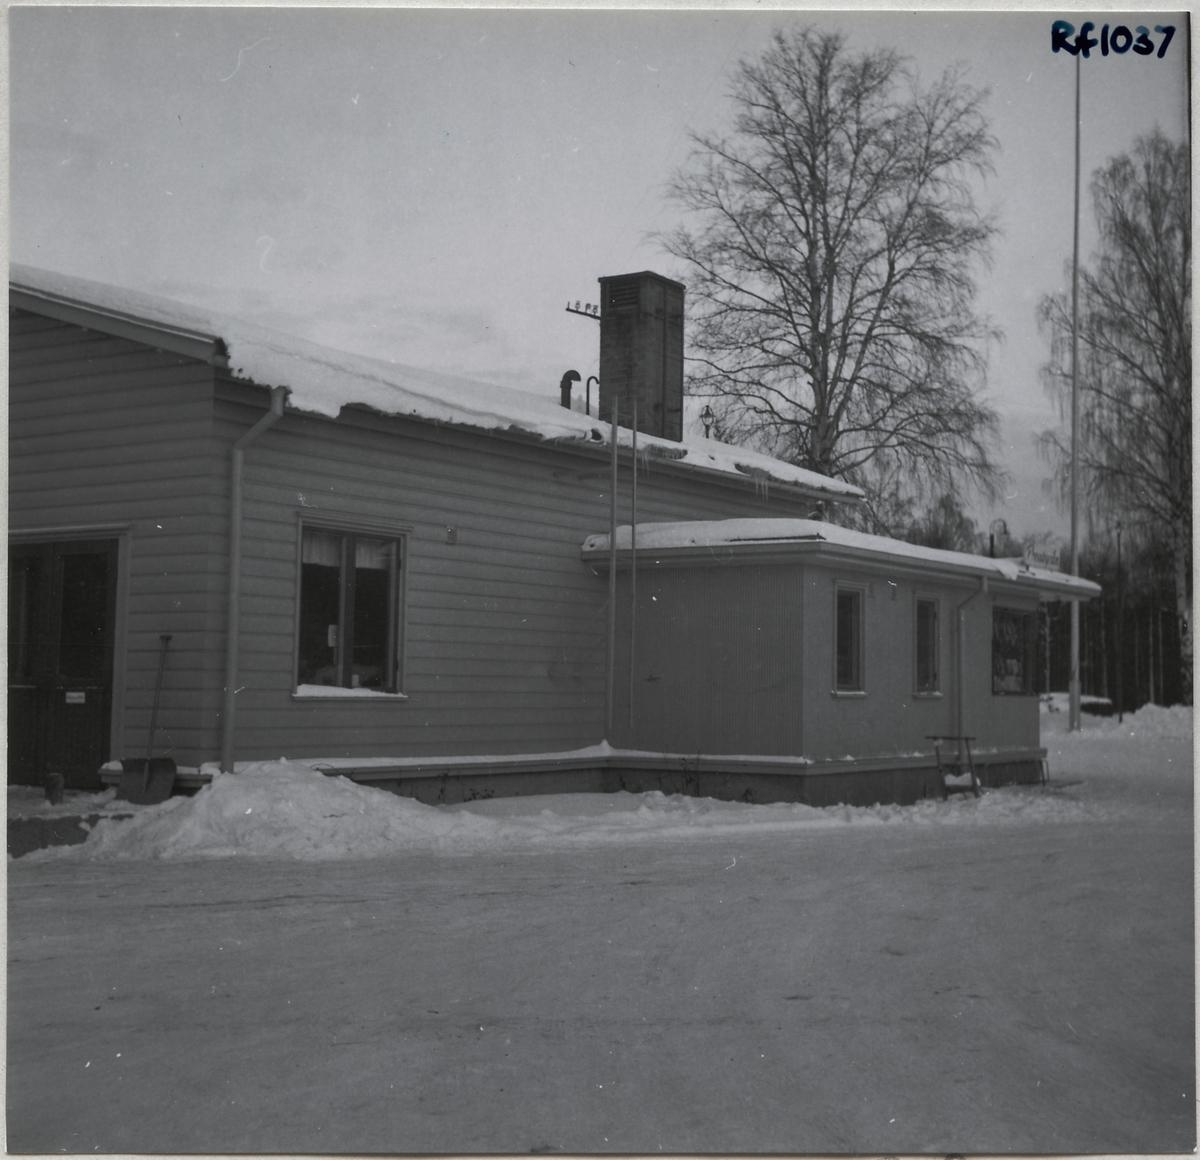 Grycksbo stationshus.